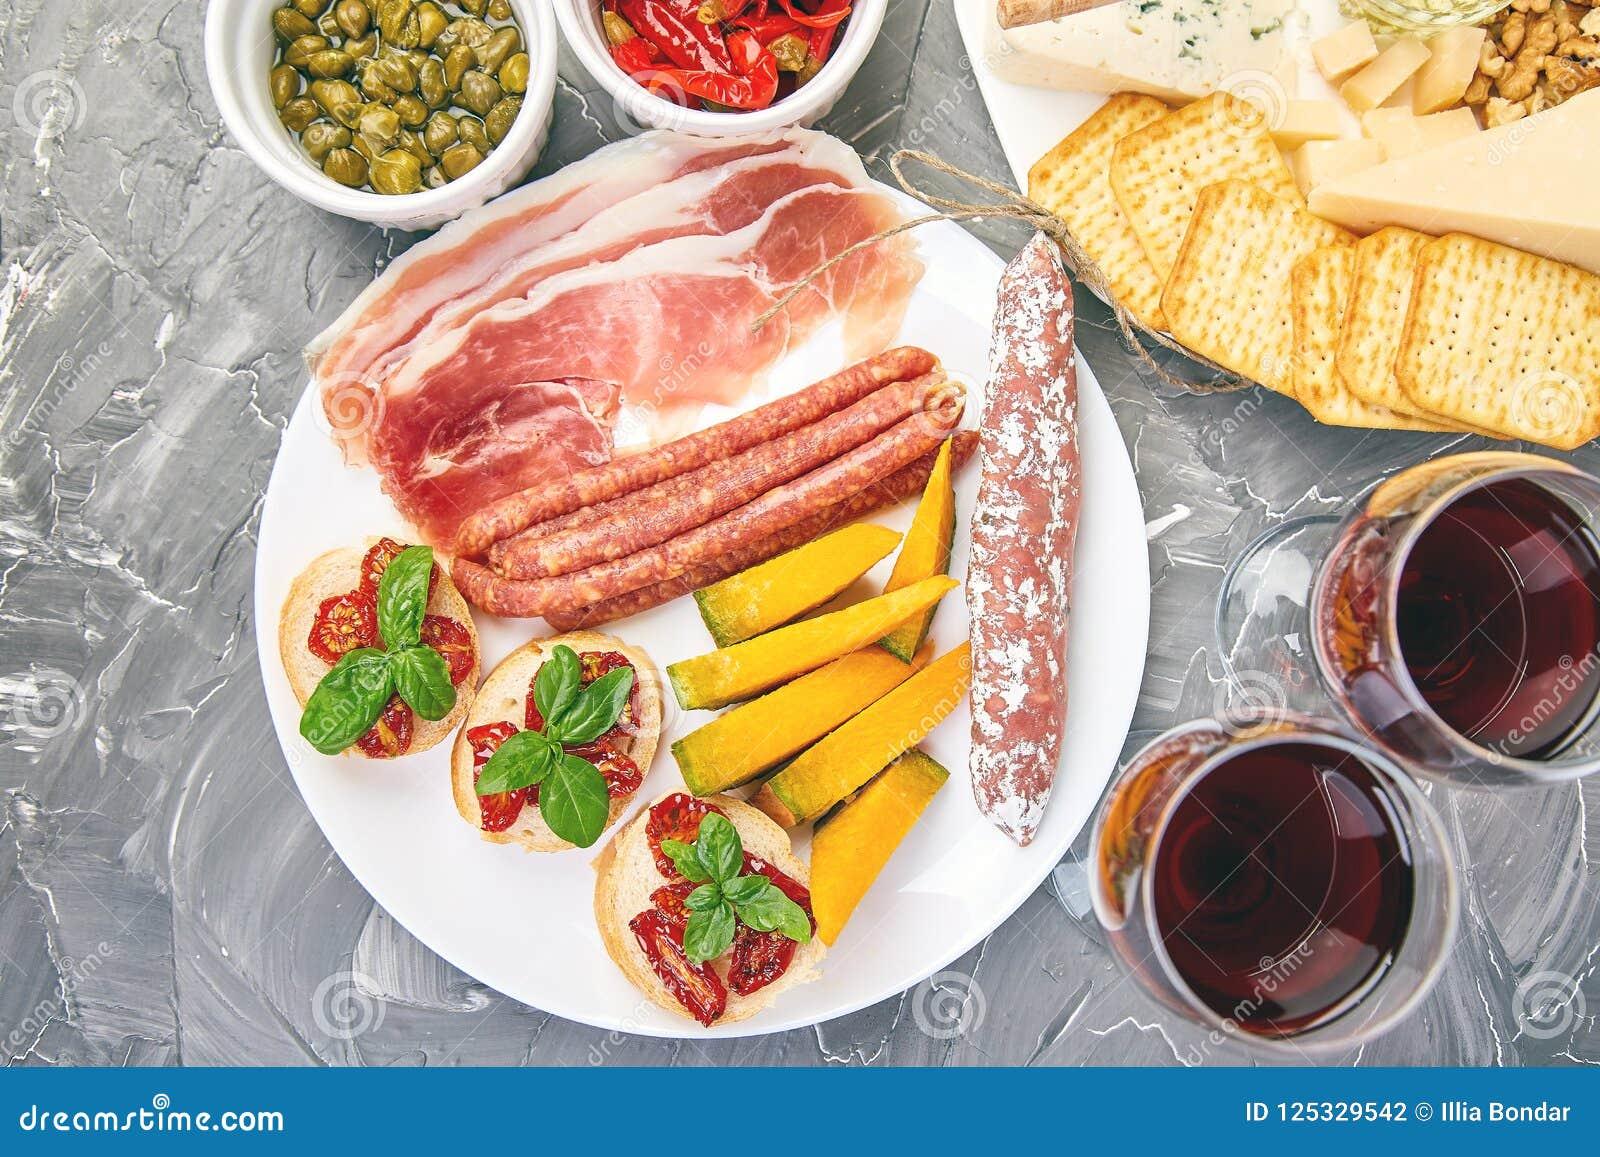 Italian Antipasti Wine Snacks Set Italian Food Stock Photo Image Of Plate Background 125329542